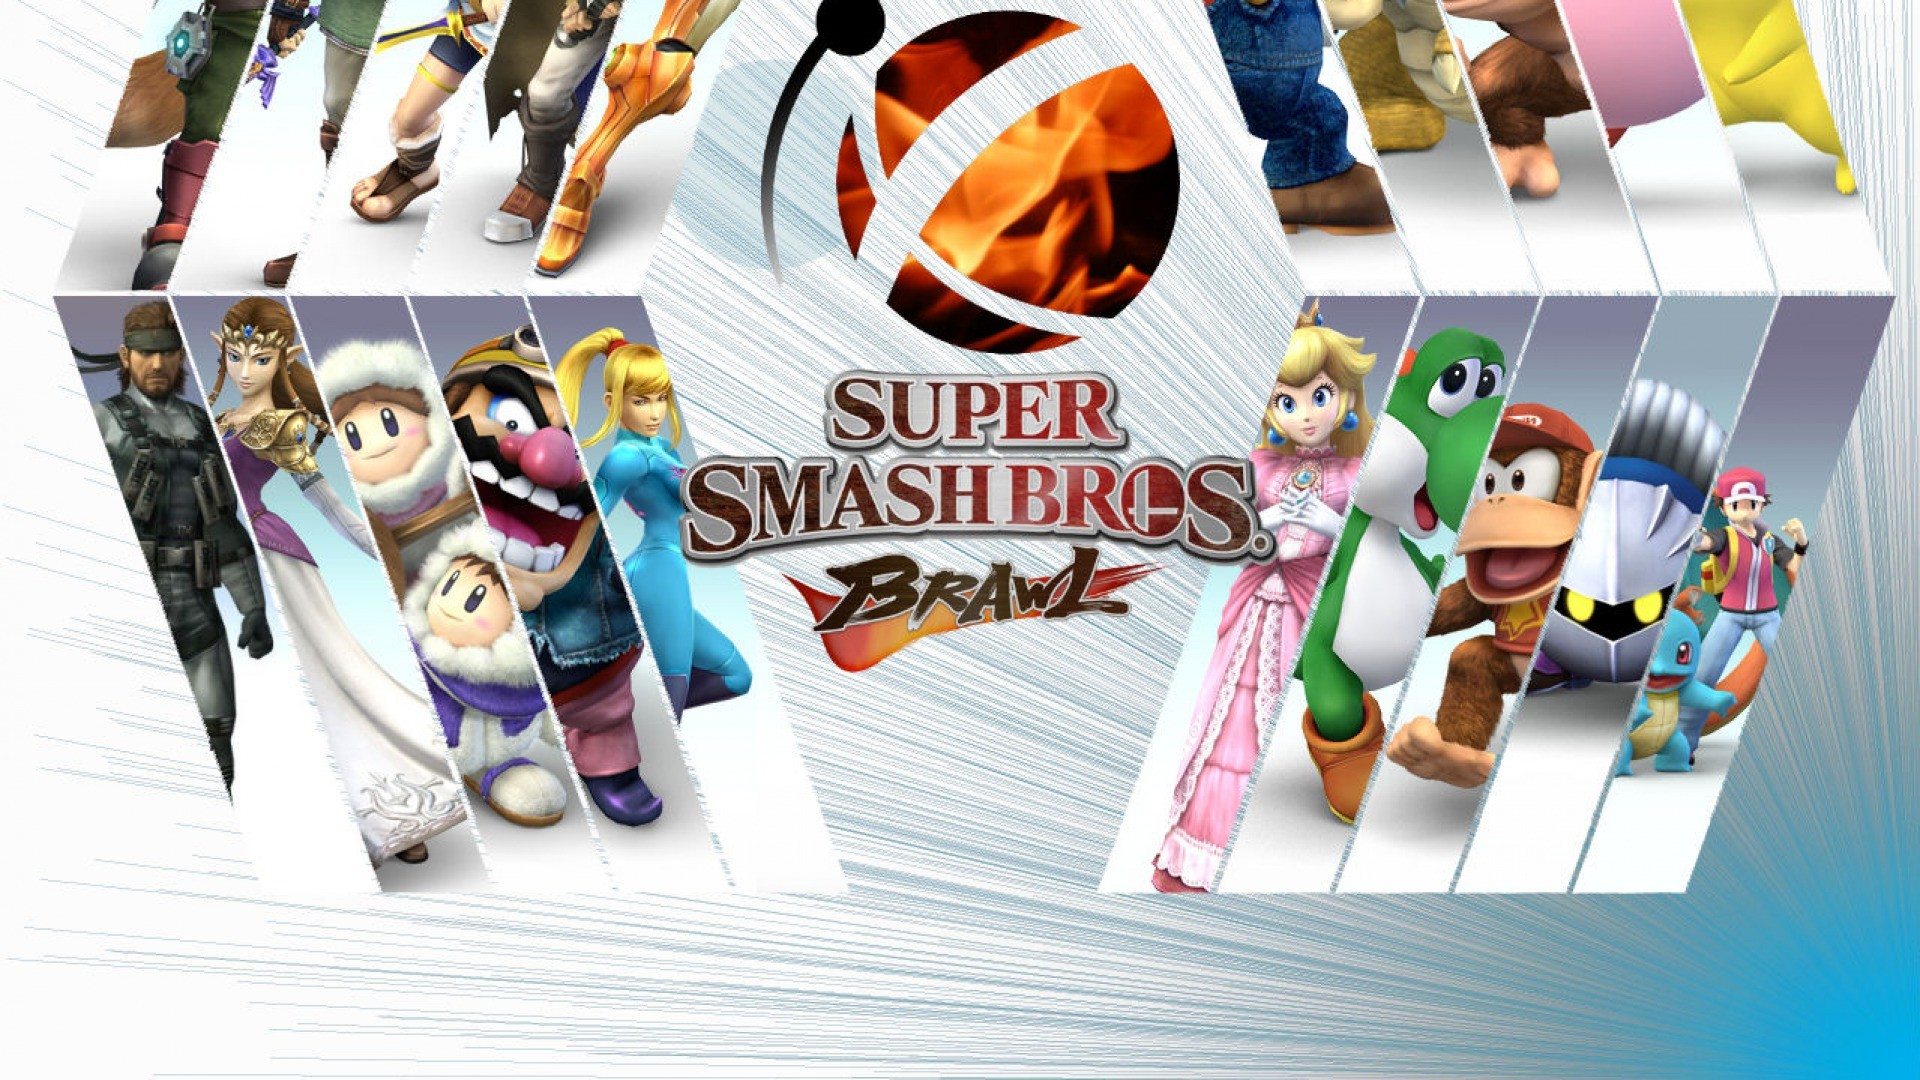 Super Smash Brothers Brawl Hd Wallpaper Iphone 7 Plus Iphone 8